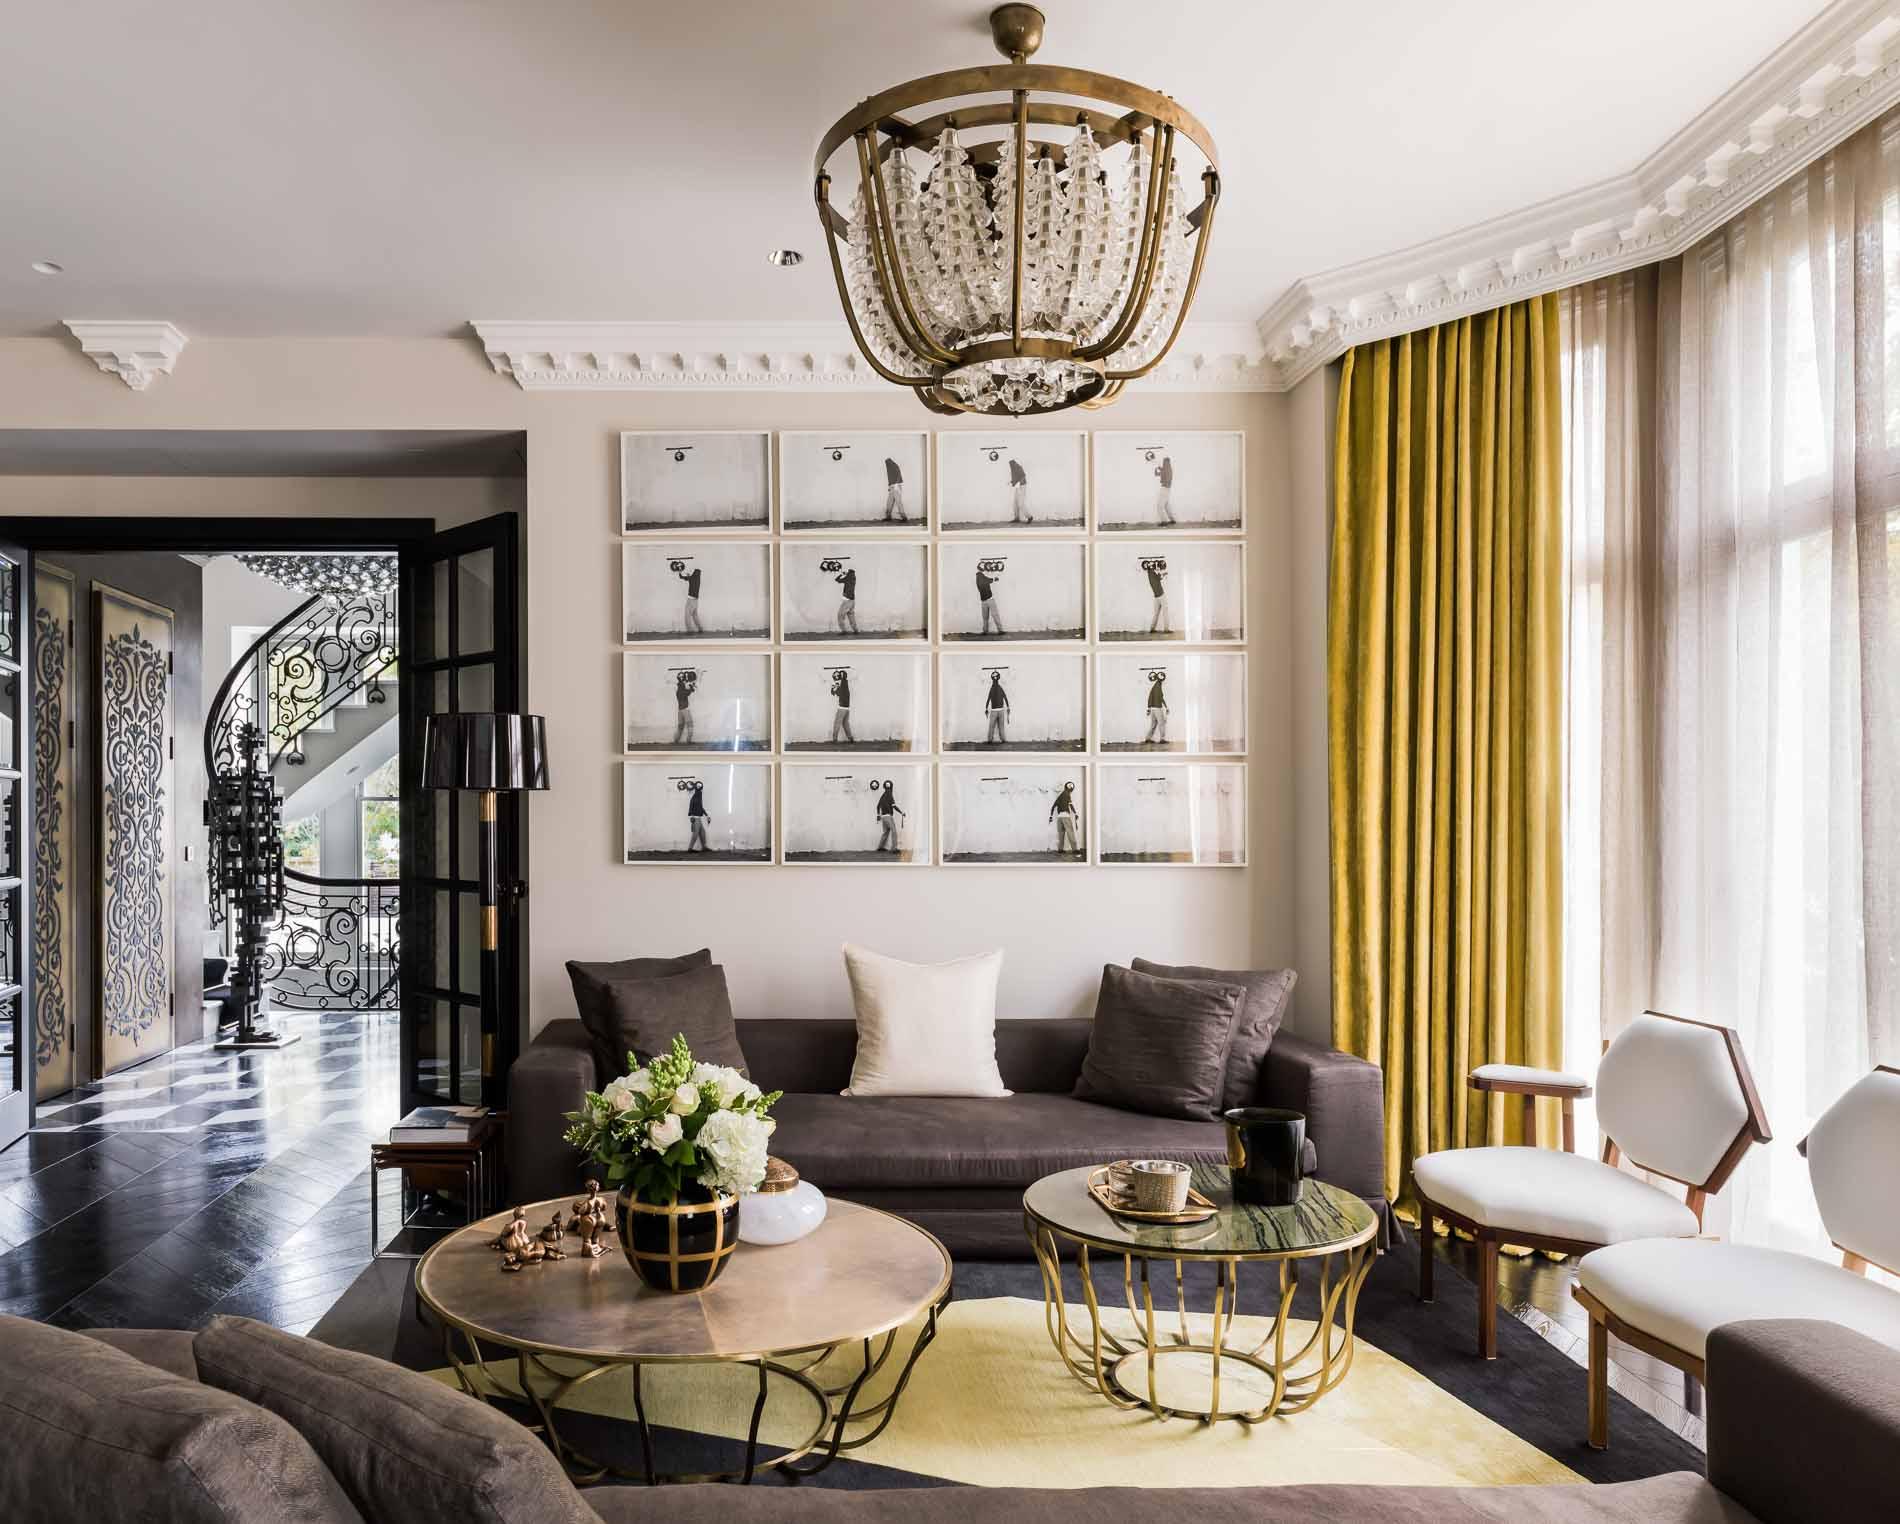 Shalini Misra | Luxury Interior Design London | Interior ...